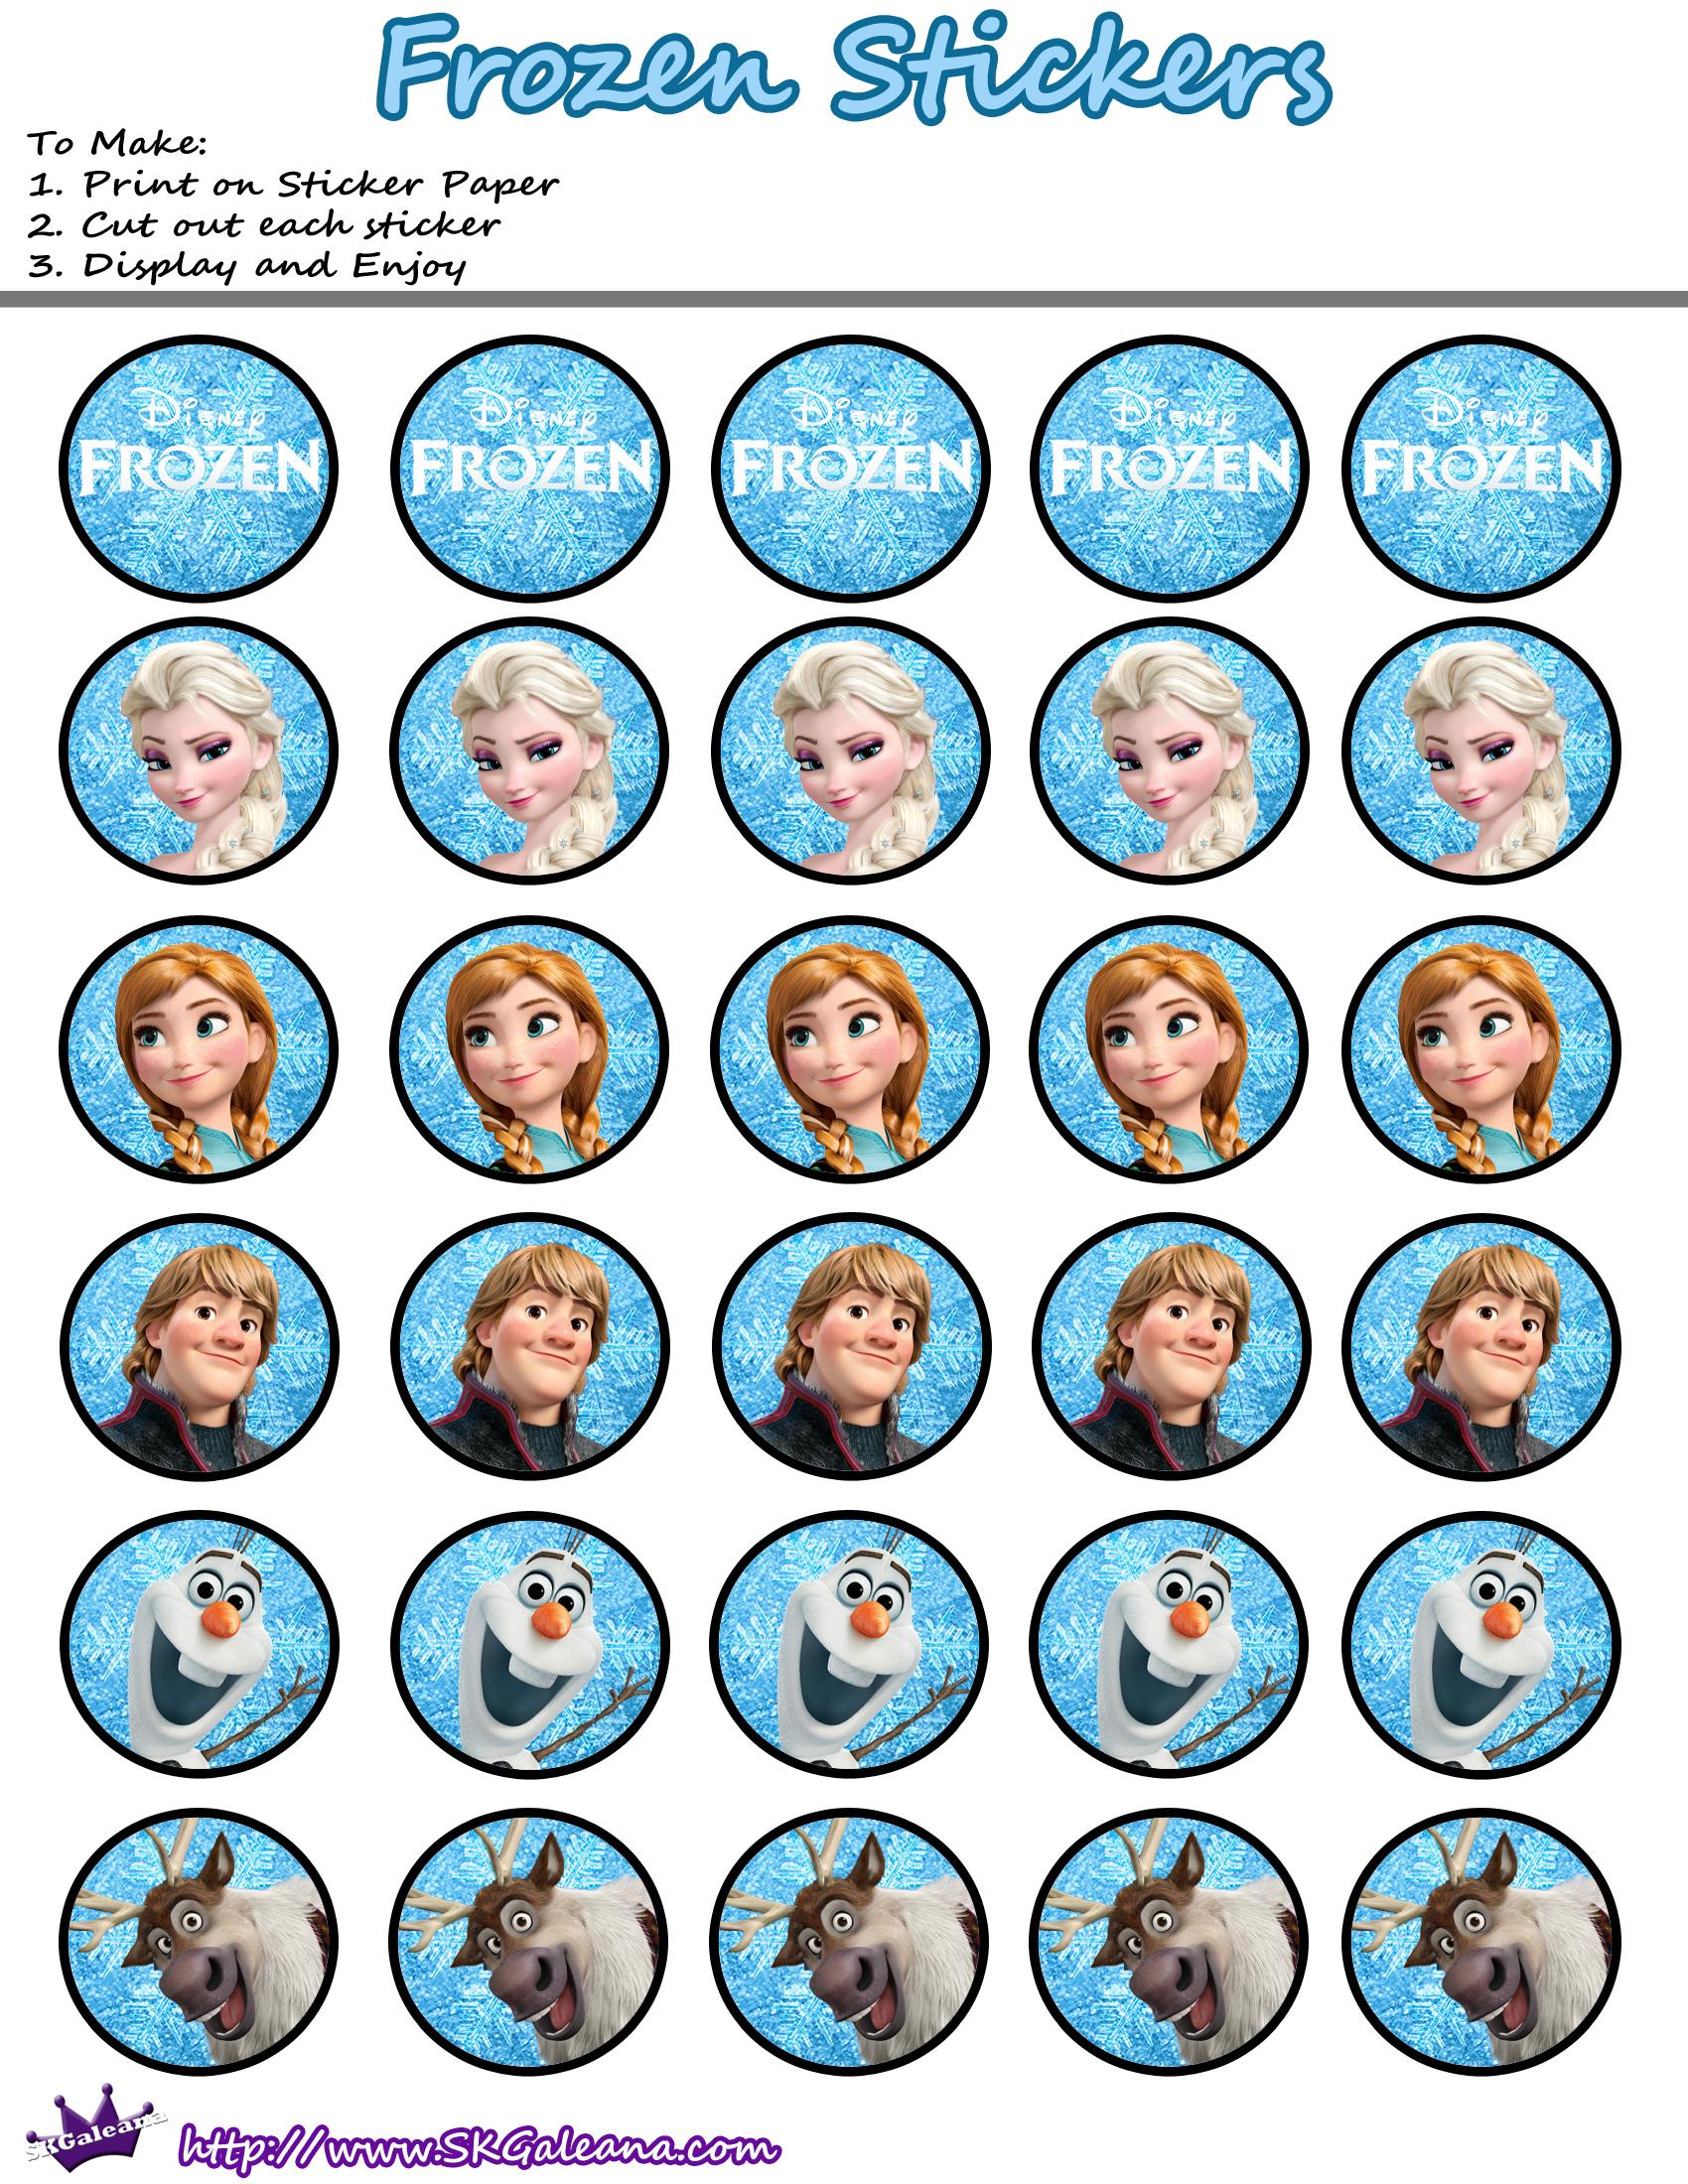 Preparando sua Festa: Festa Frozen